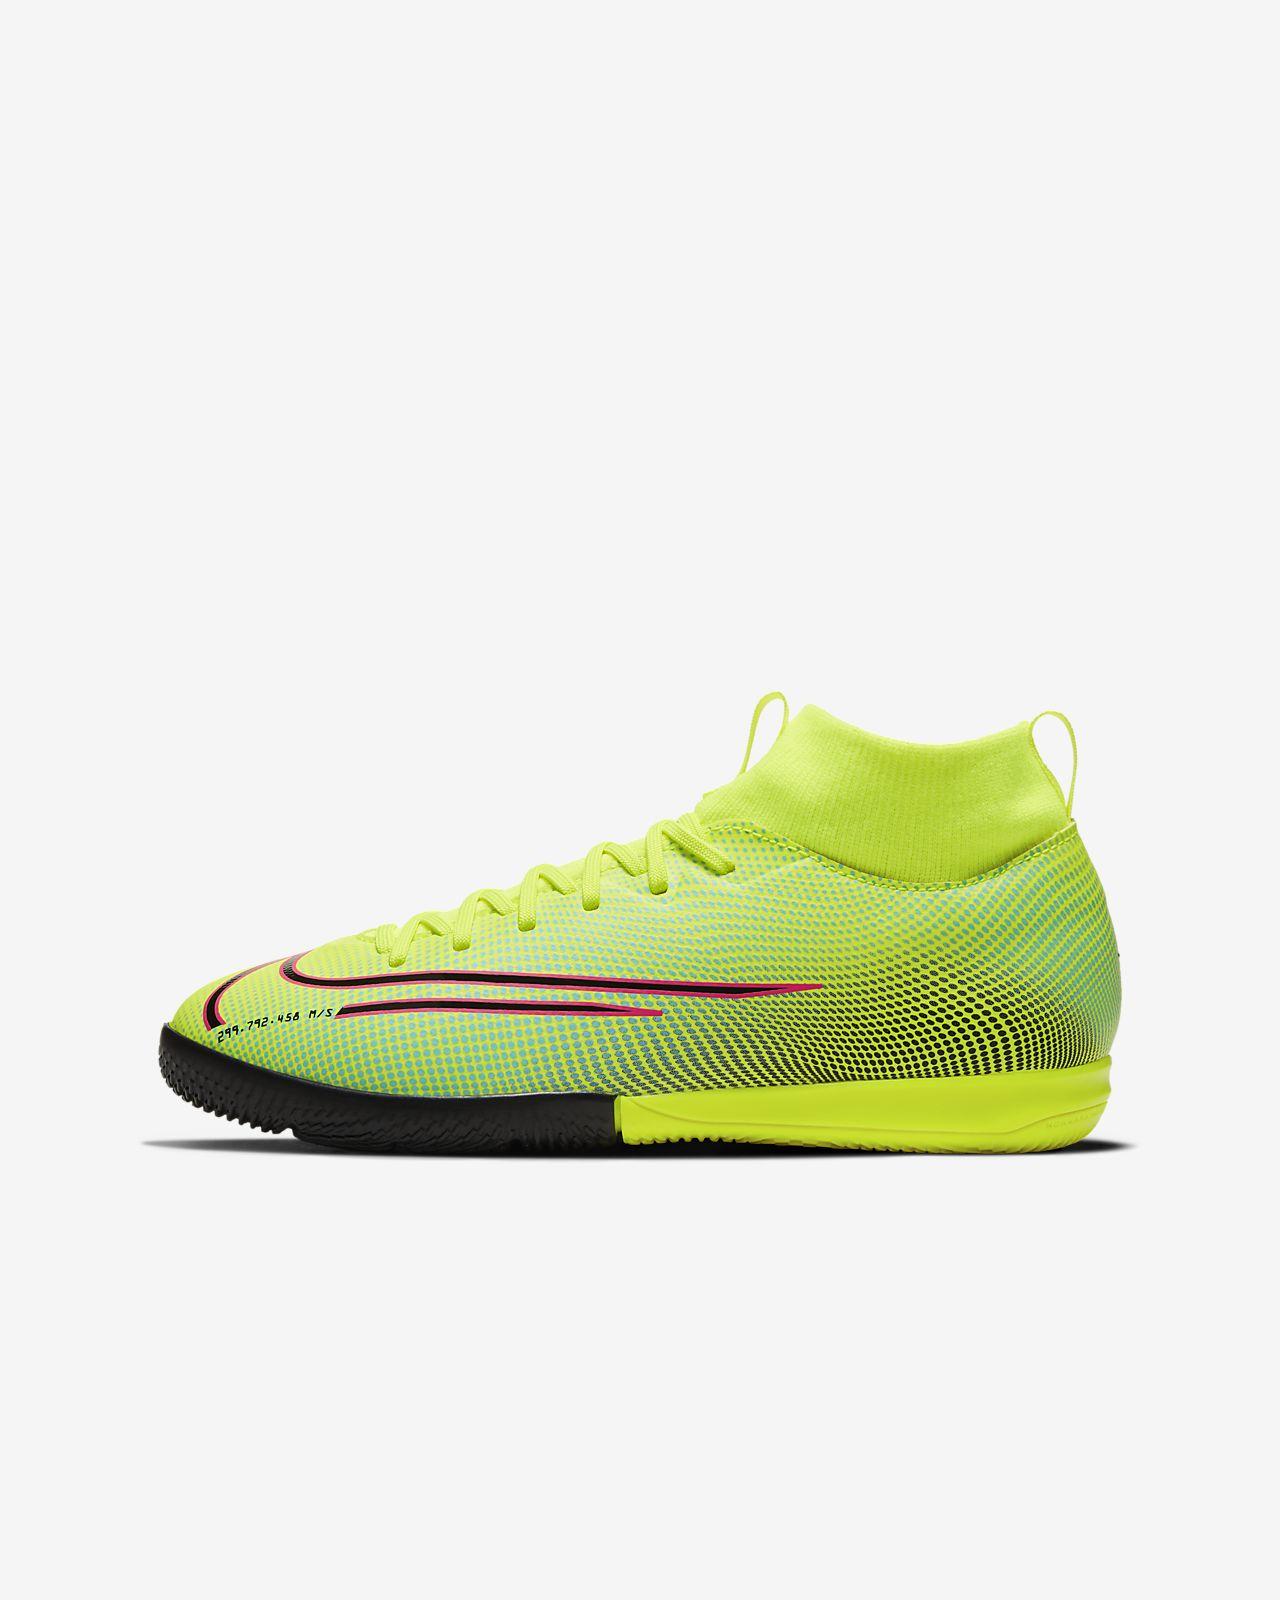 Scarpa da calcio per campi indoorcemento Nike Jr. Mercurial